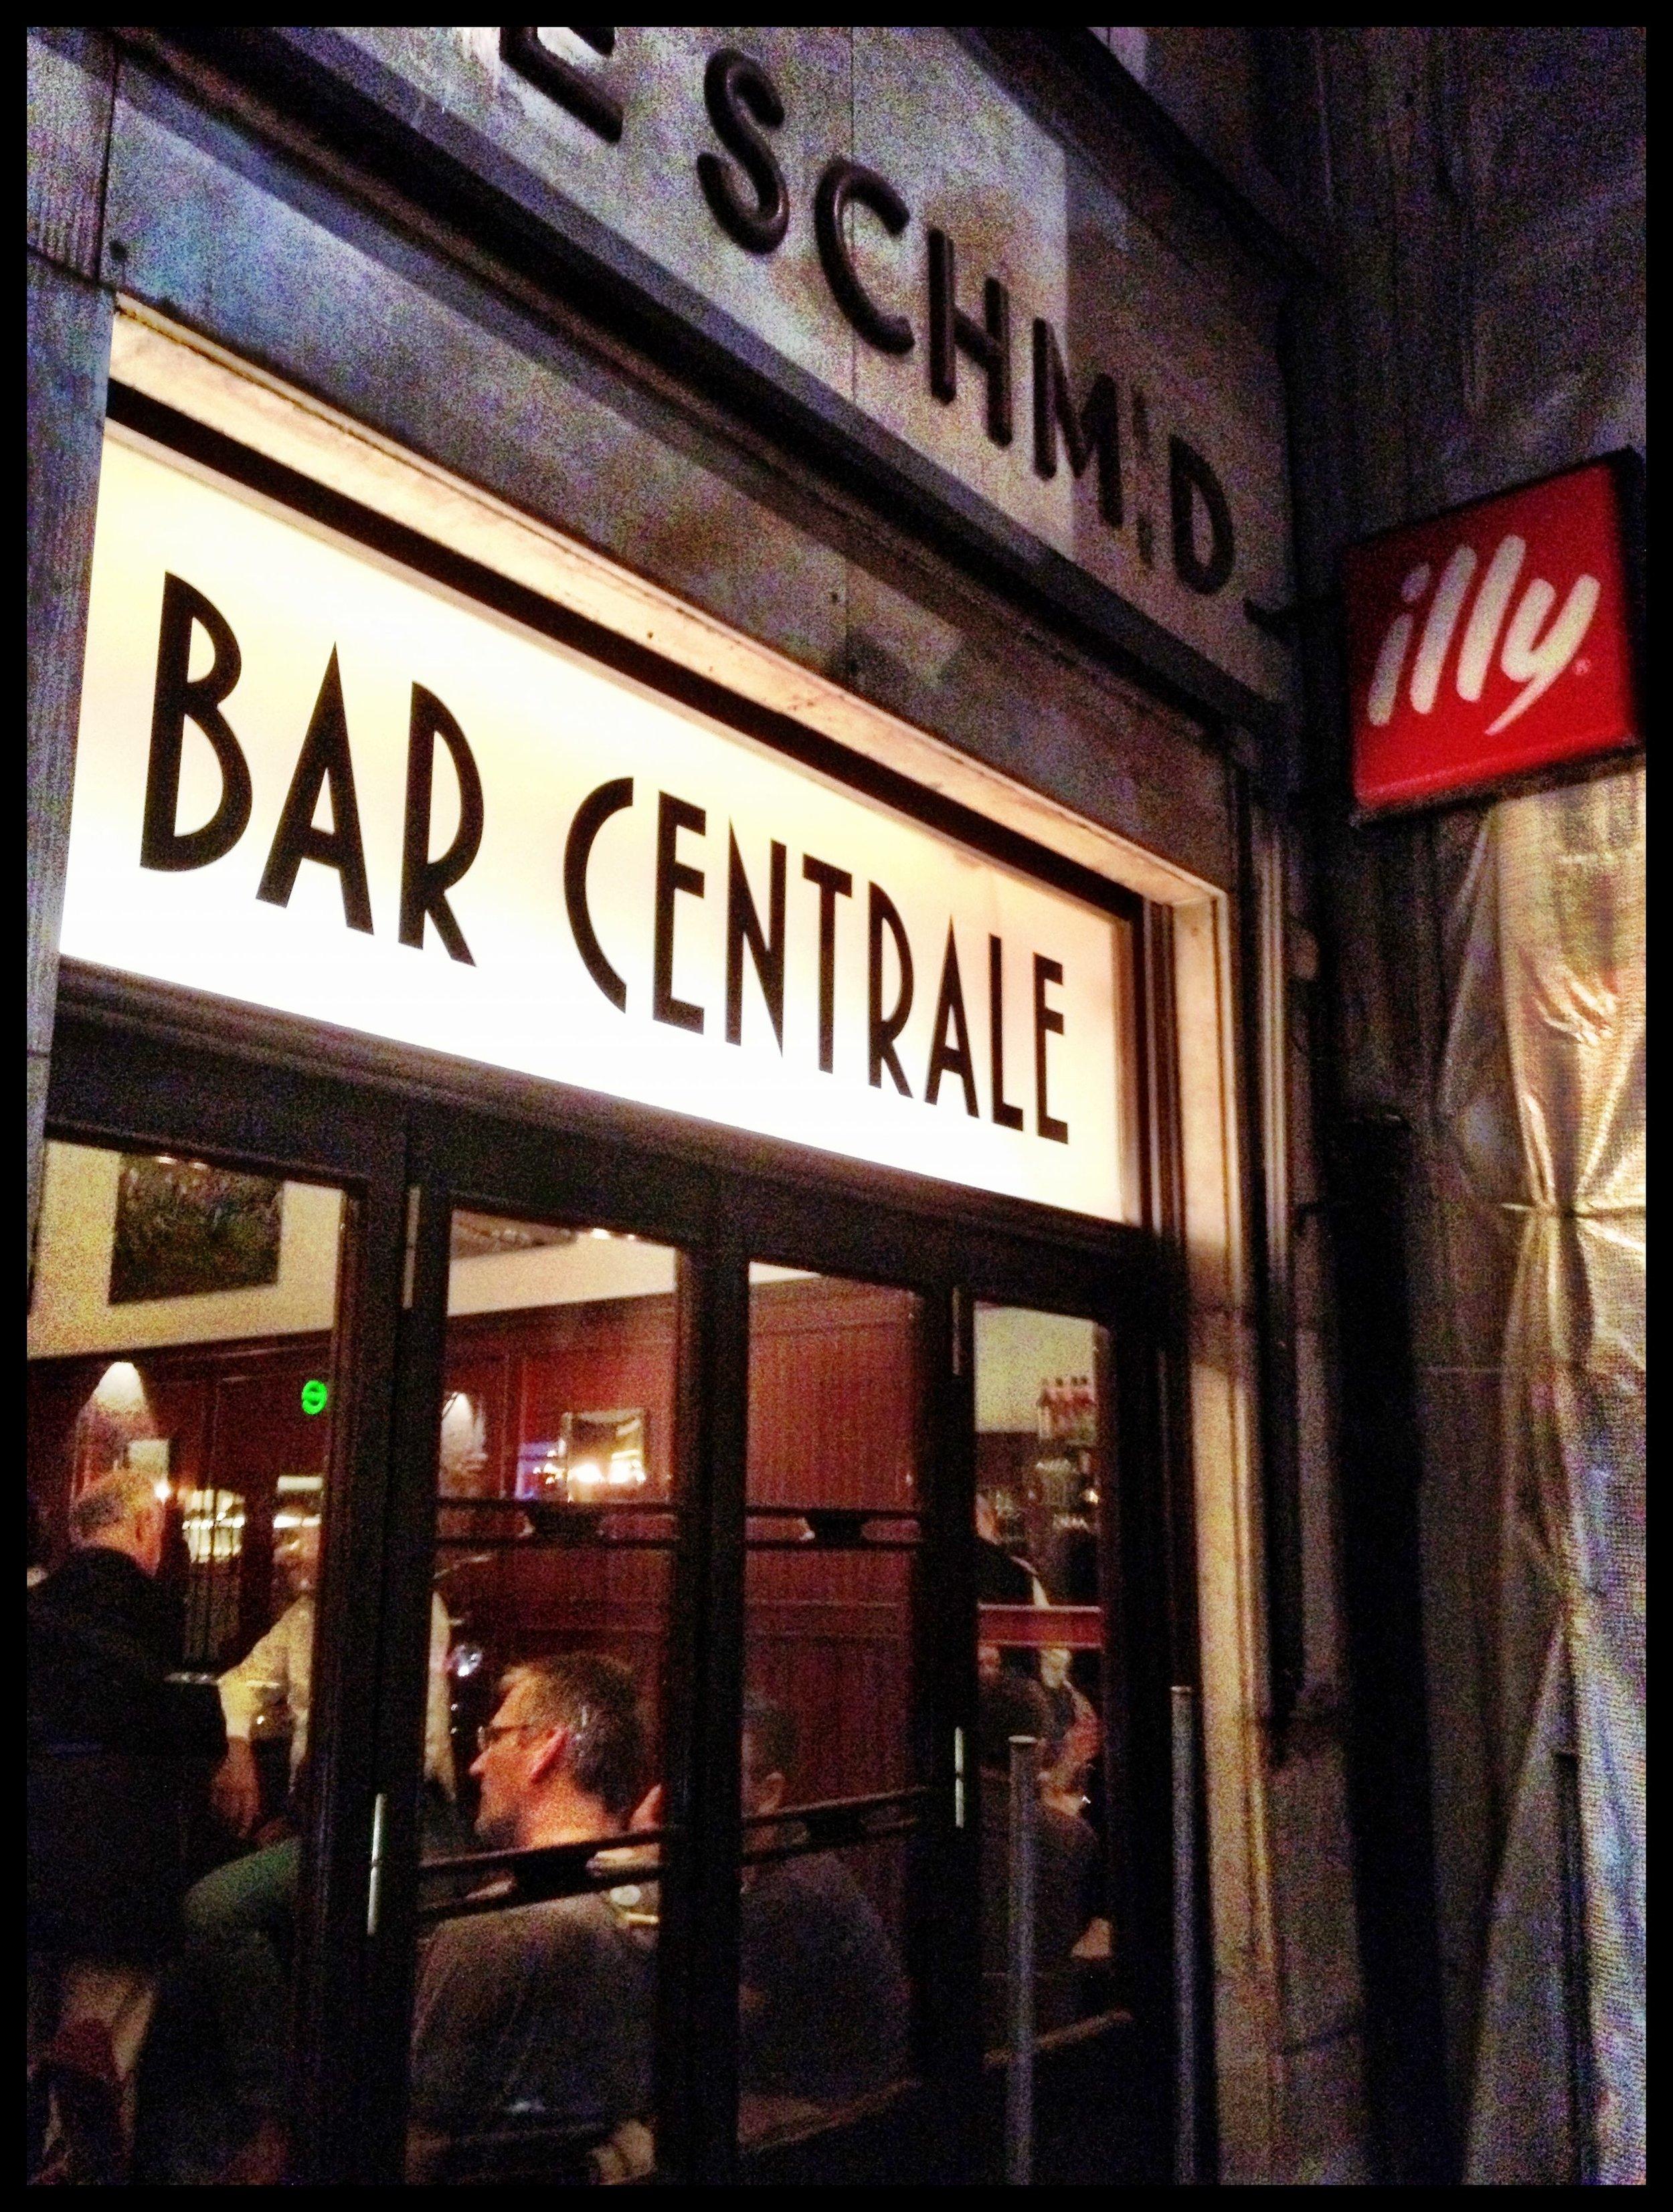 BAR & CLUB_  BAR CENTRALE.  #Bar #Centrale #Cortiina #Classic   https://www.bar-centrale.com